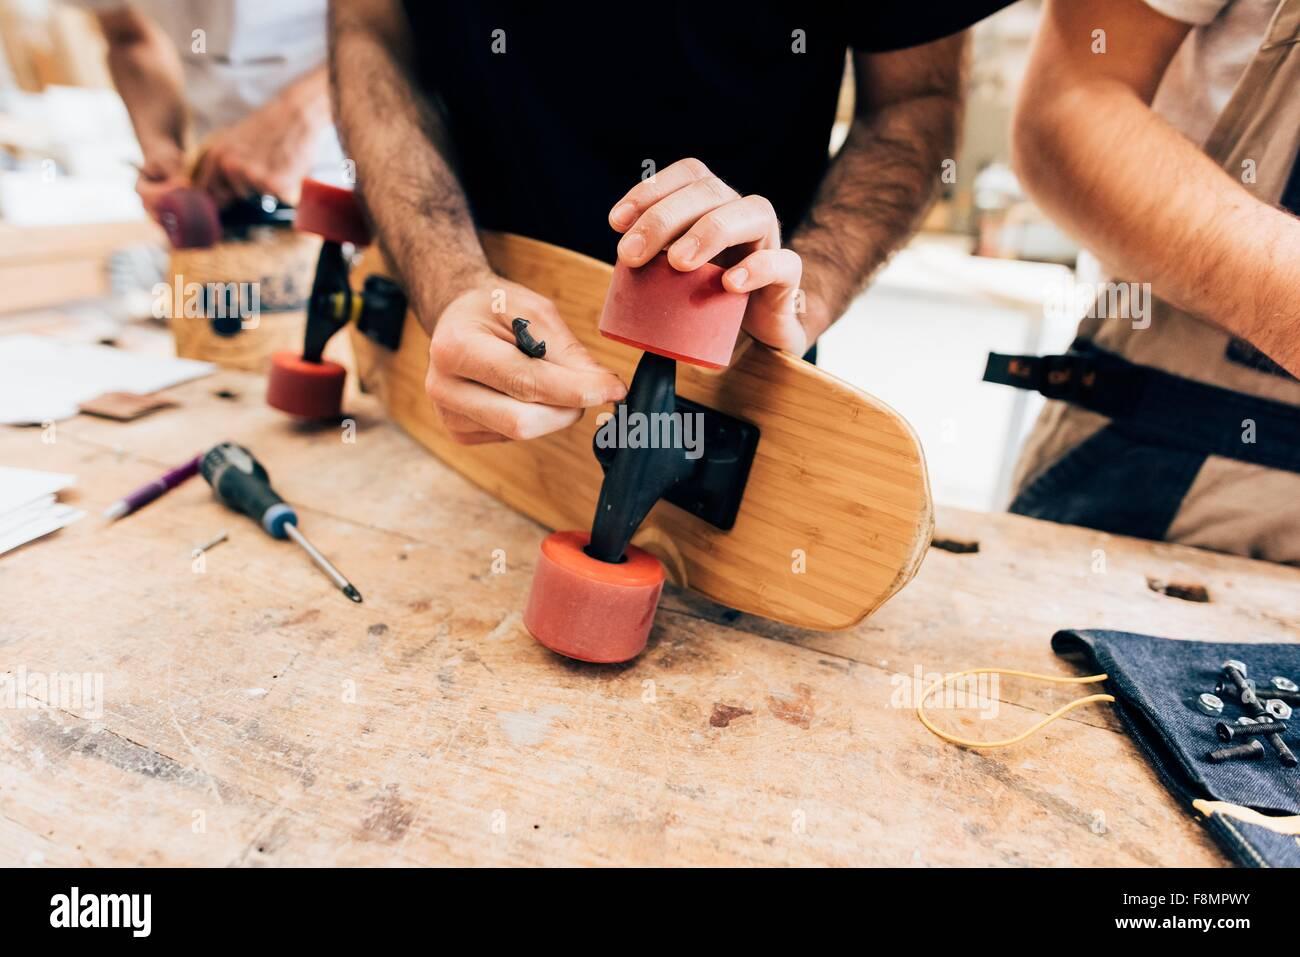 Ansicht der jungen Männer im Workshop Befestigung Räder Skateboard beschnitten Stockbild